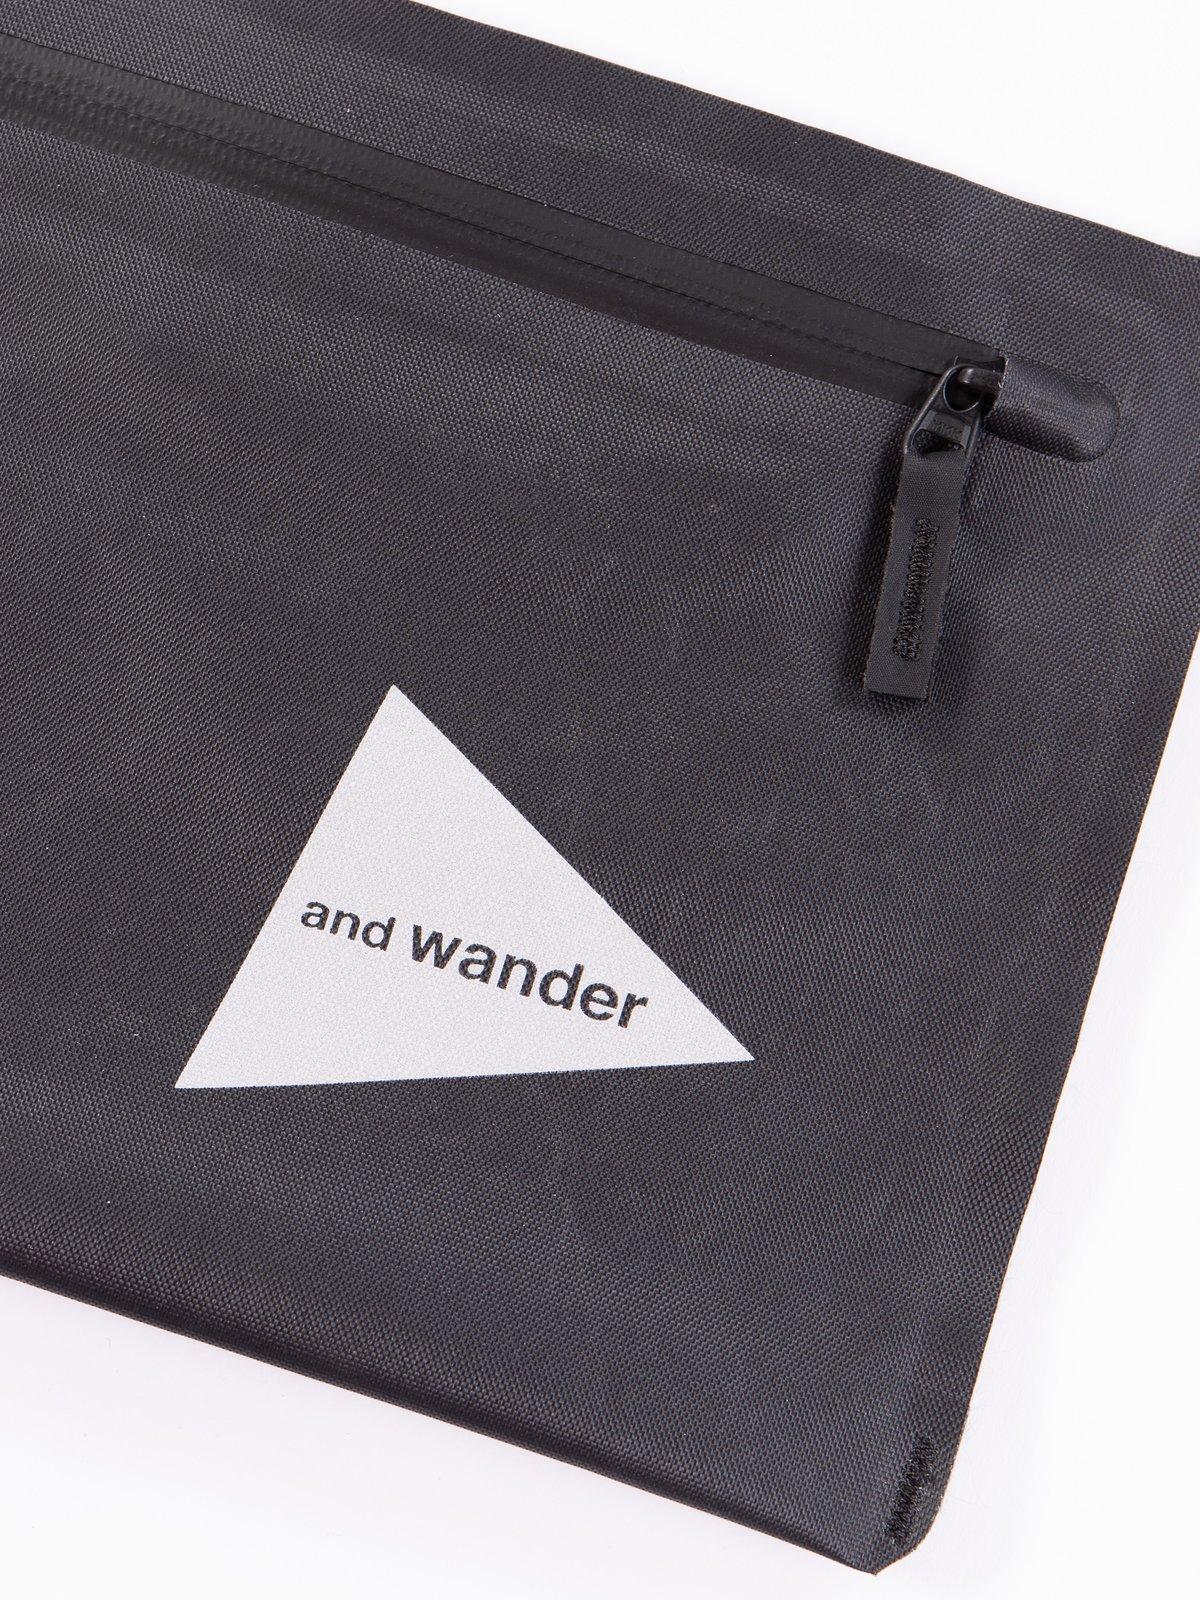 Black Waterproof Sacoche Bag - Image 2